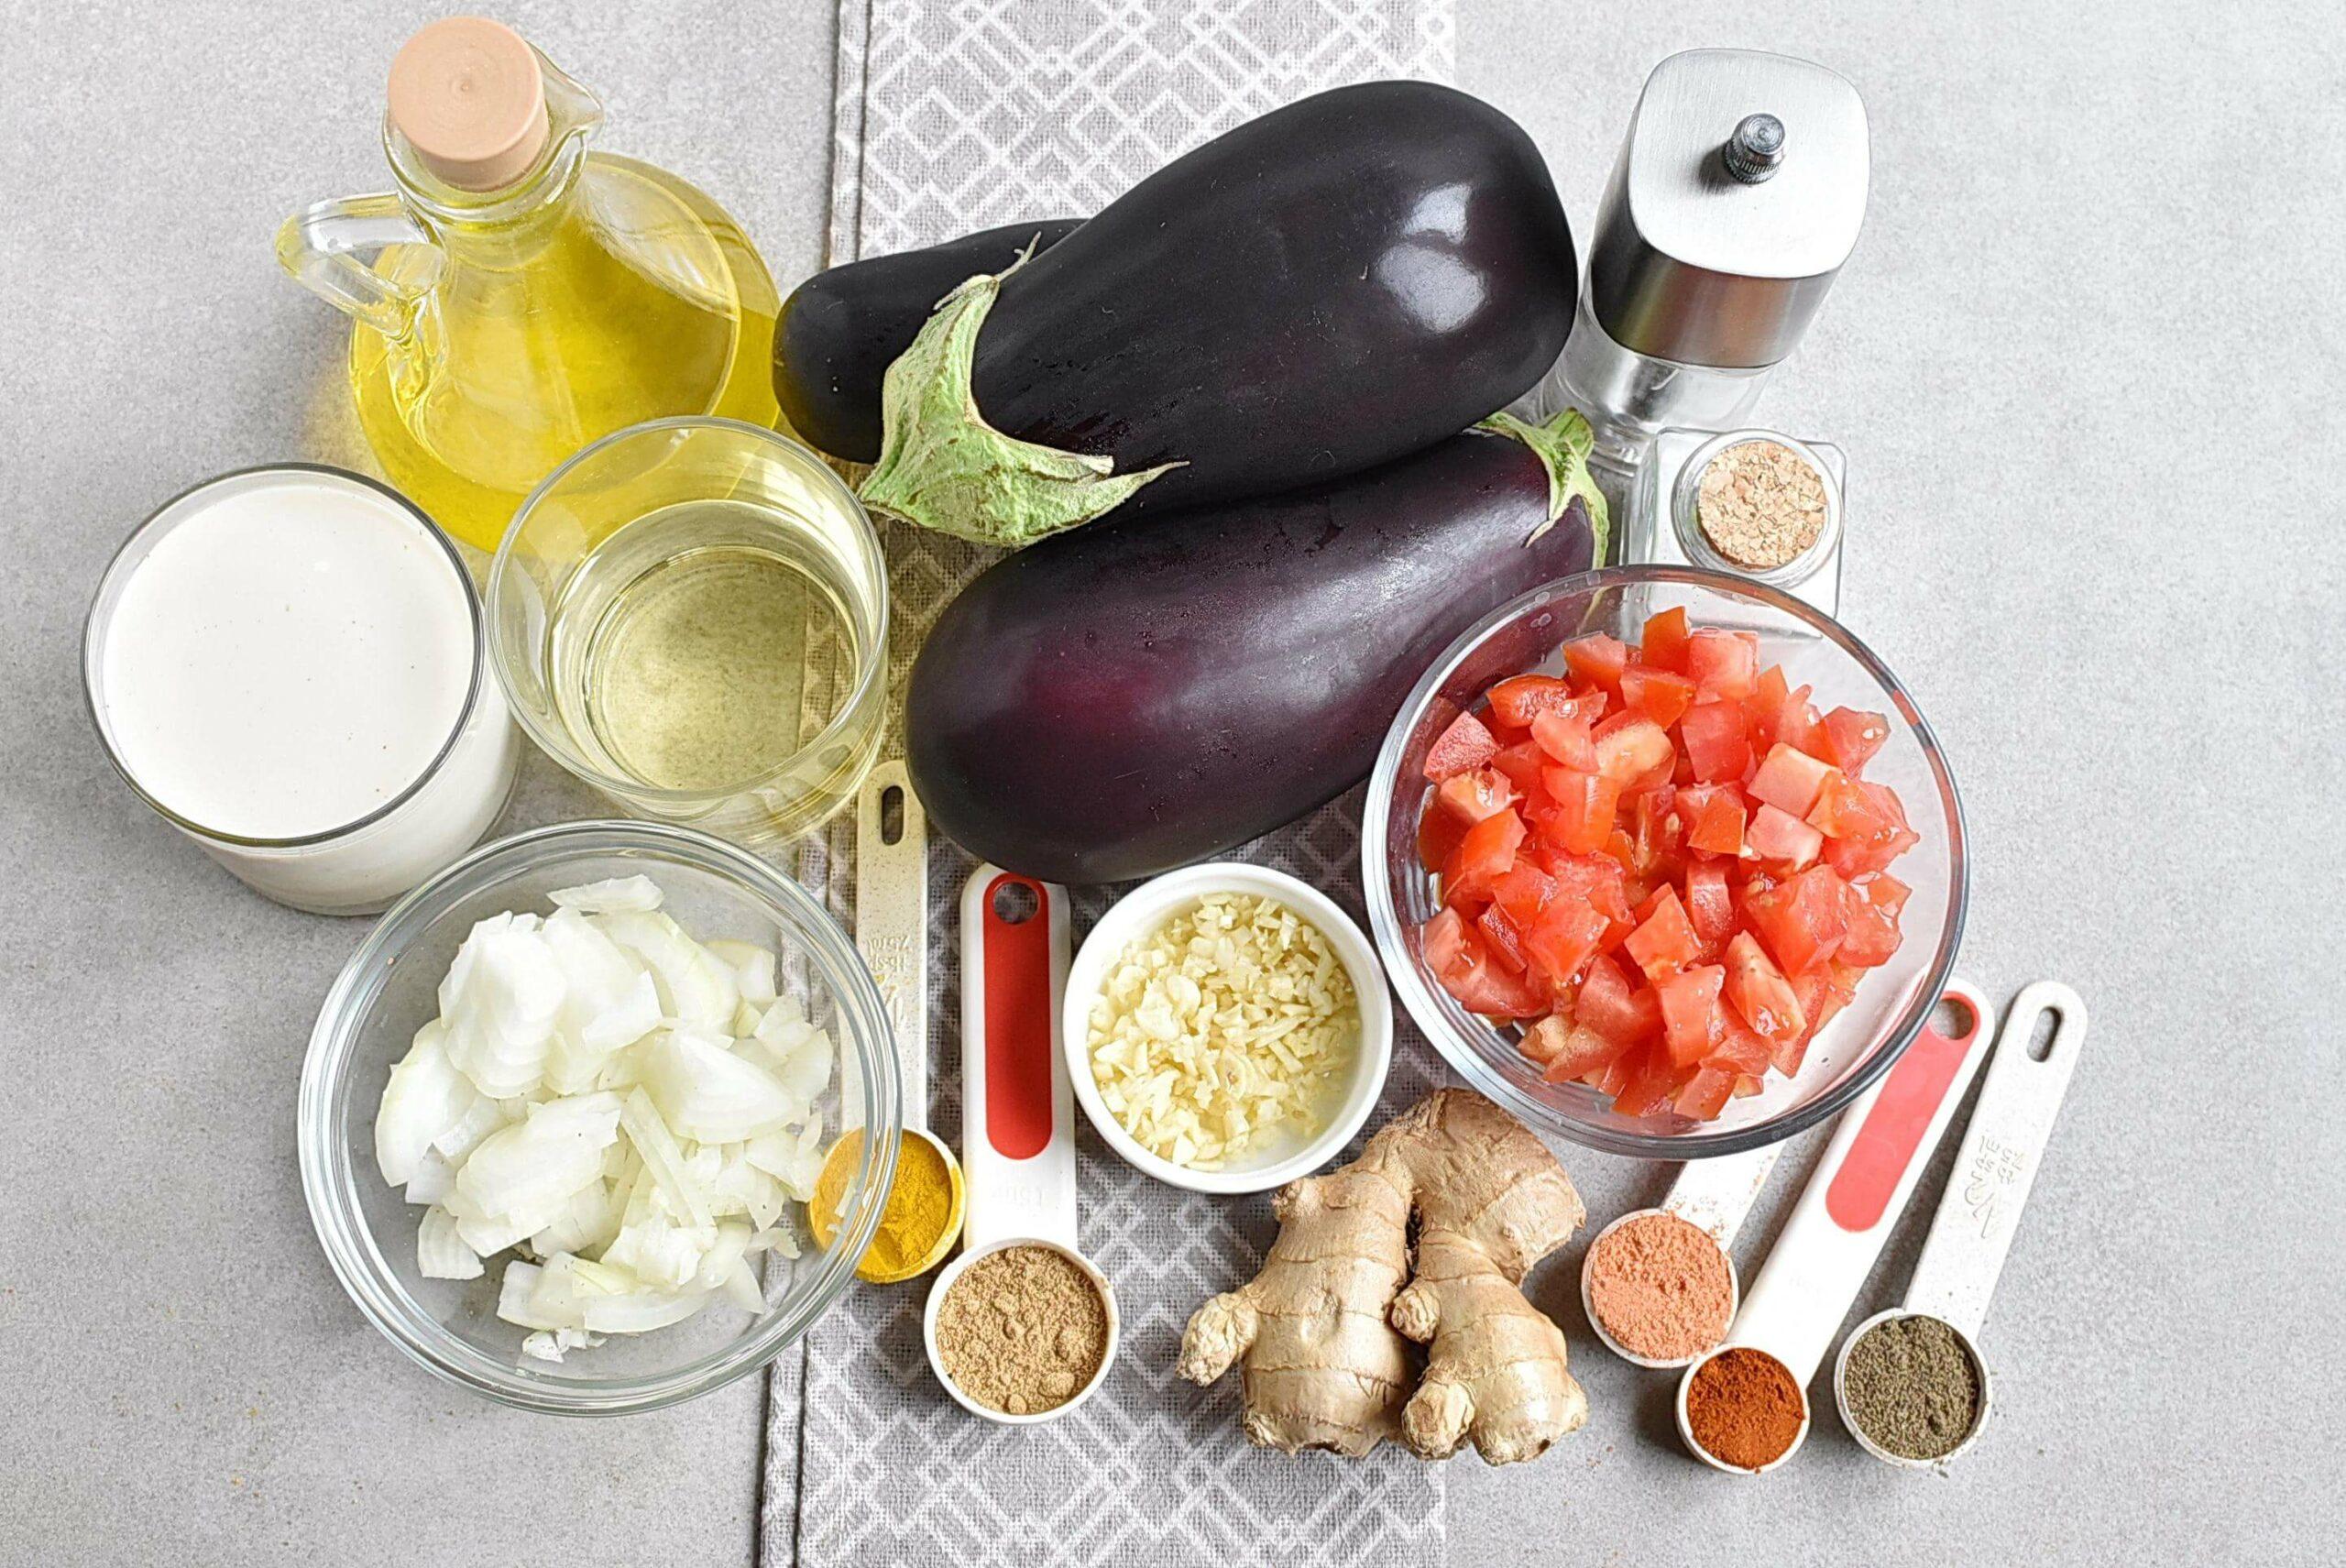 Ingridiens for Vegan Roasted Eggplant Curry